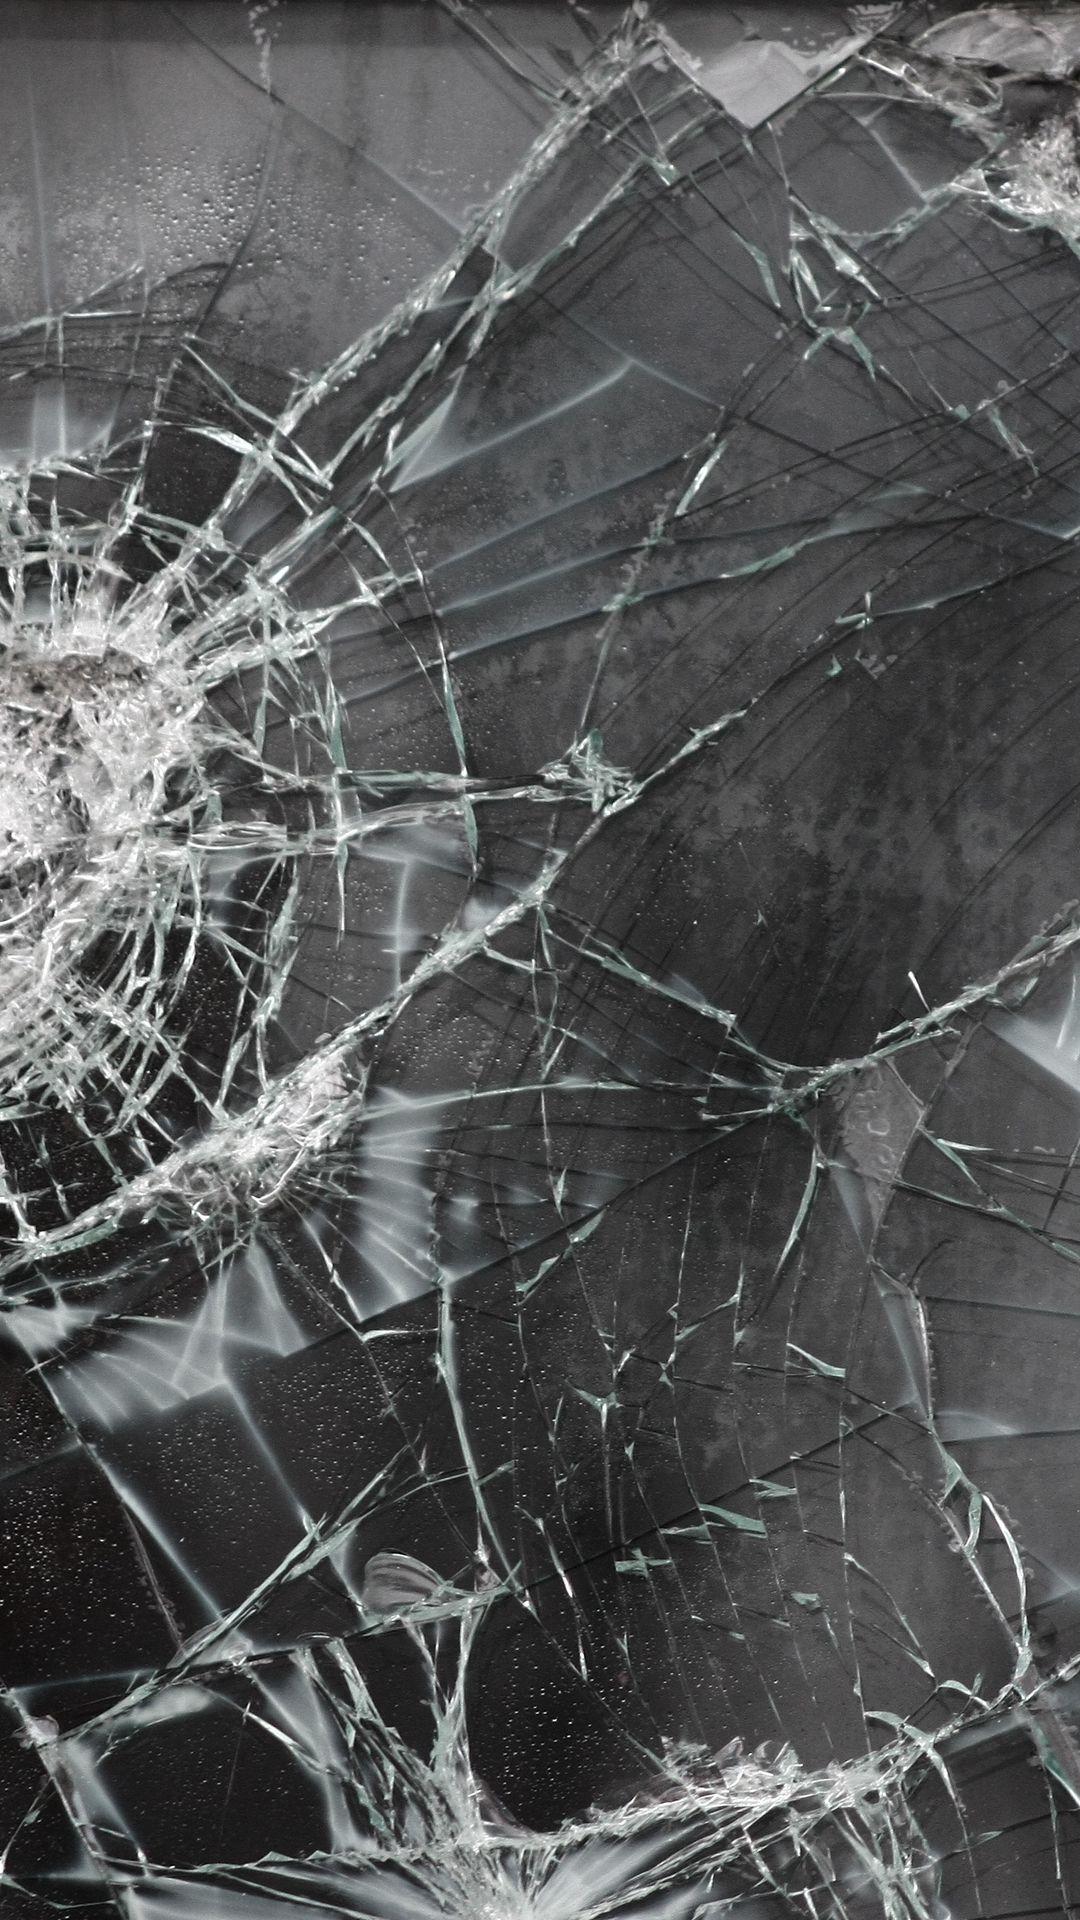 1080x1920 Wallpaper broken glass, cracks, texture